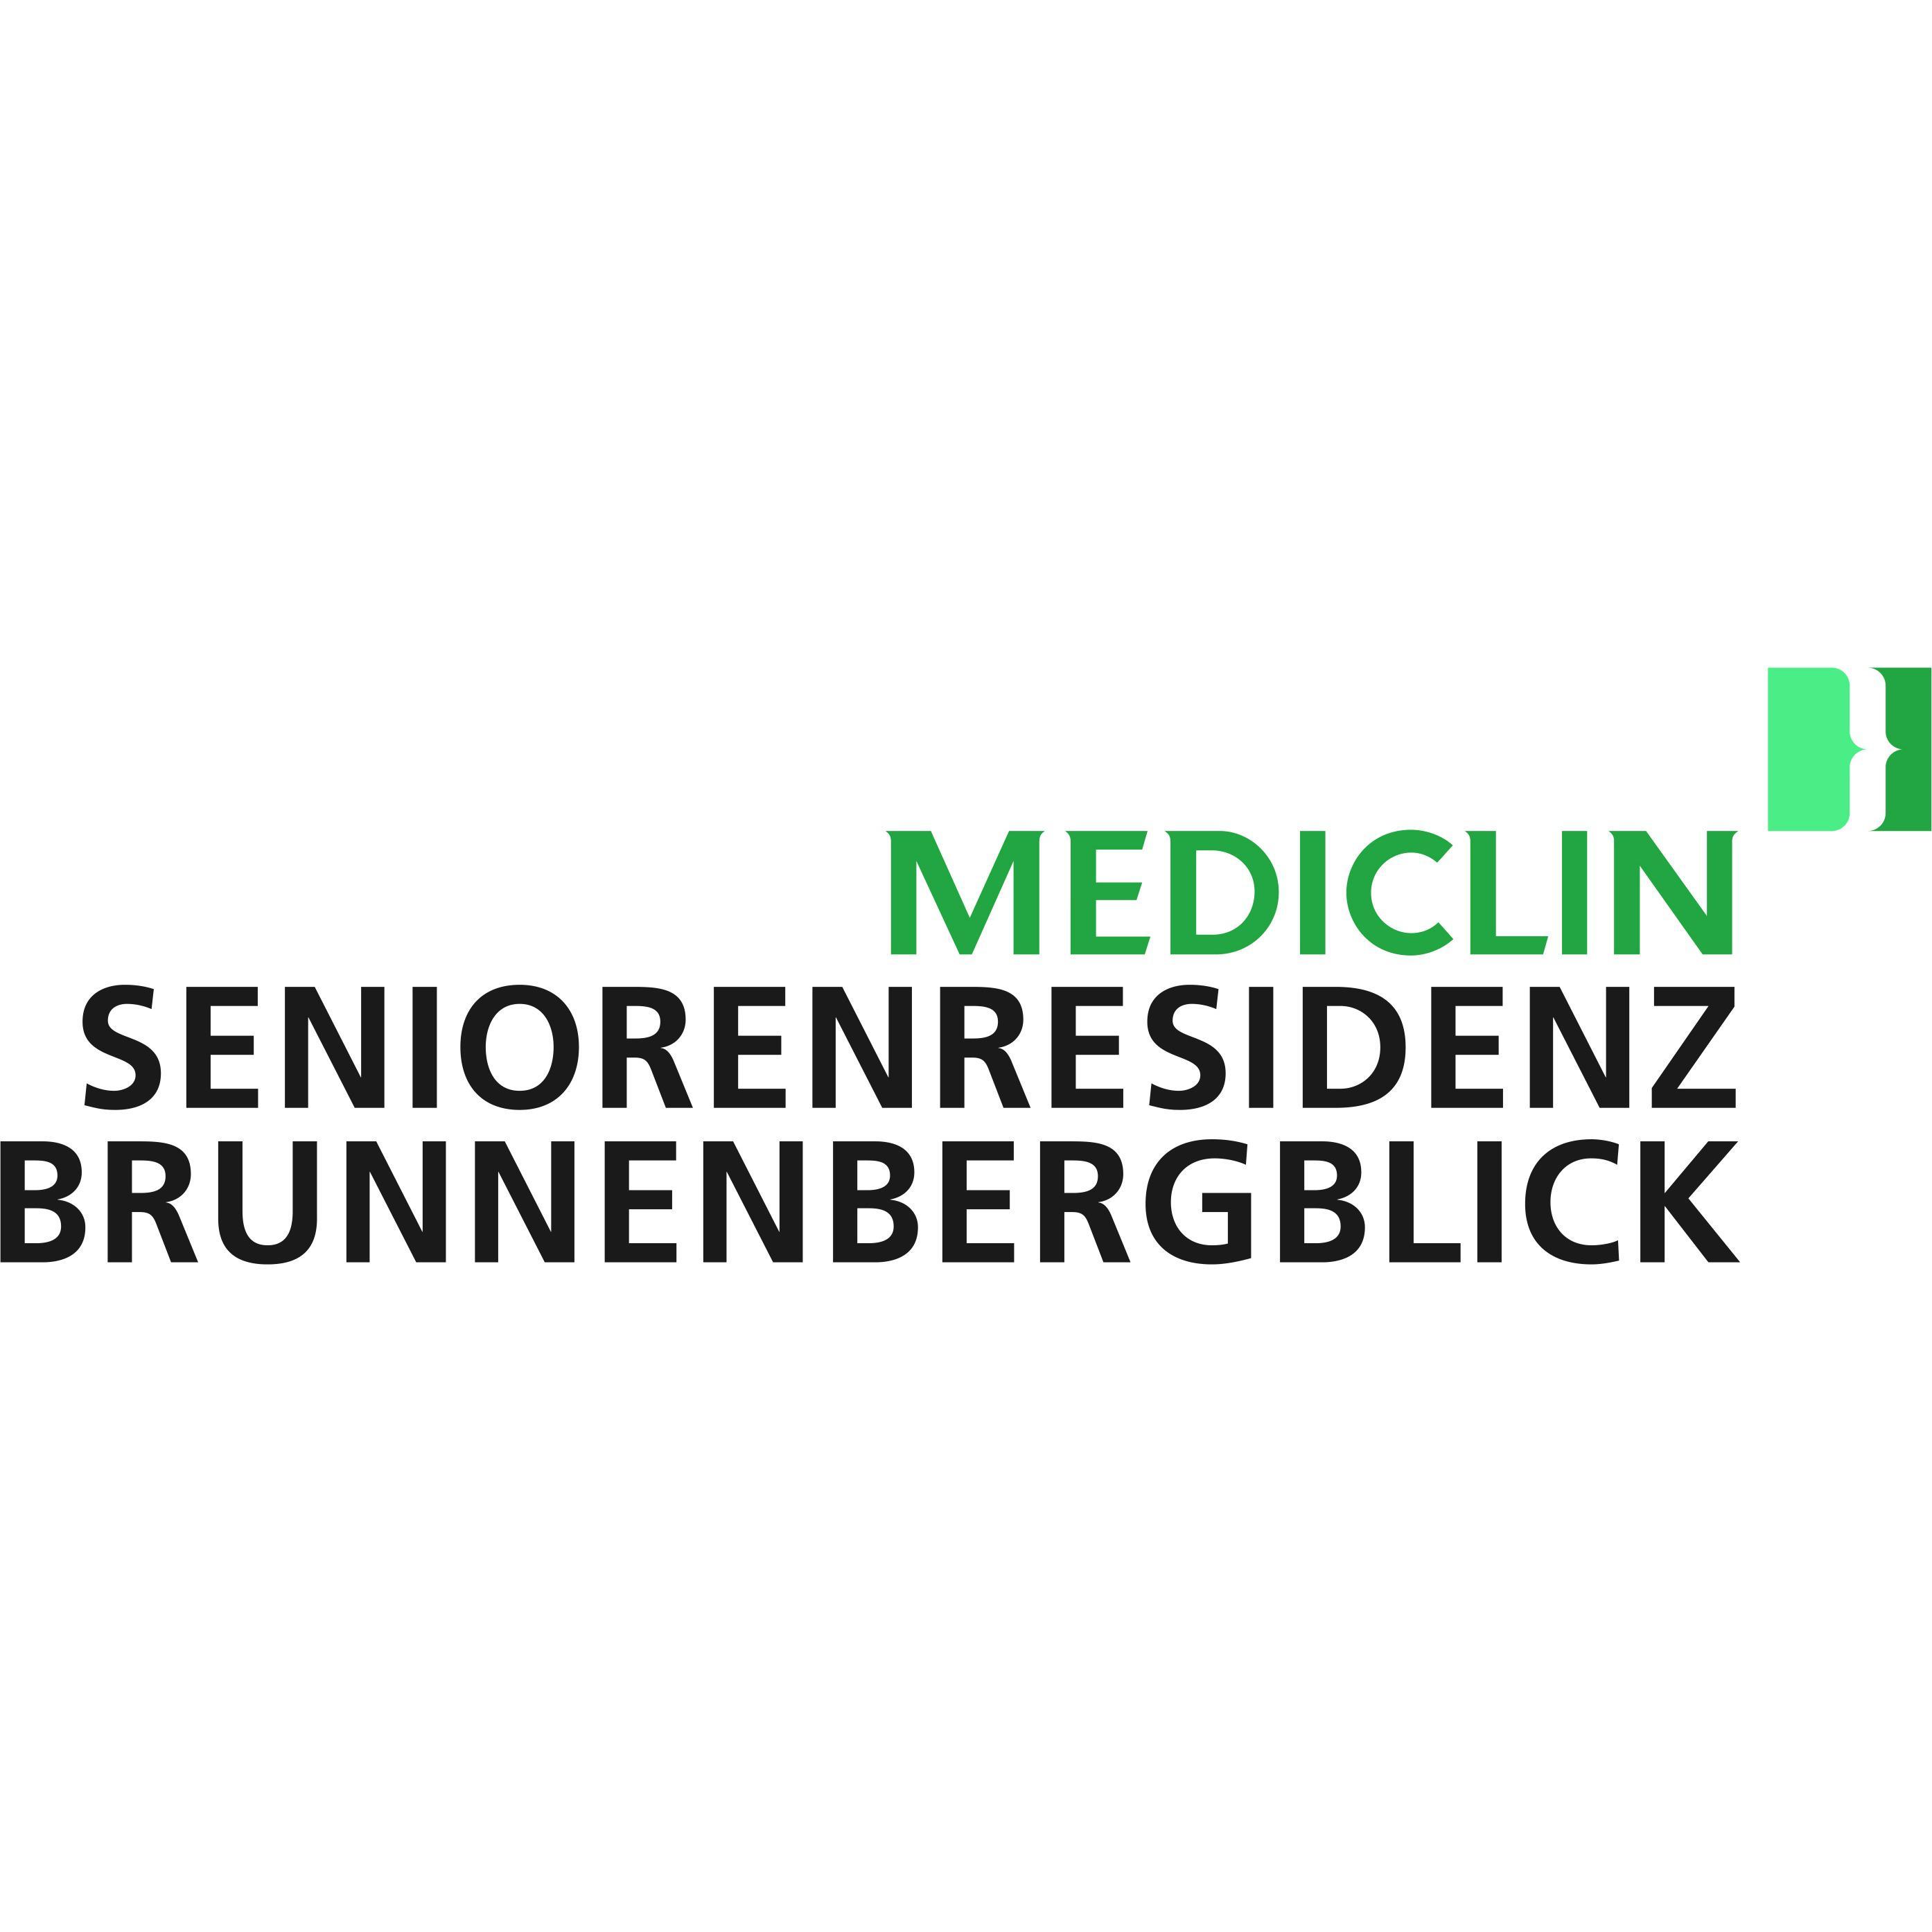 Bild zu MEDICLIN Seniorenresidenz Brunnenbergblick in Bad Elster